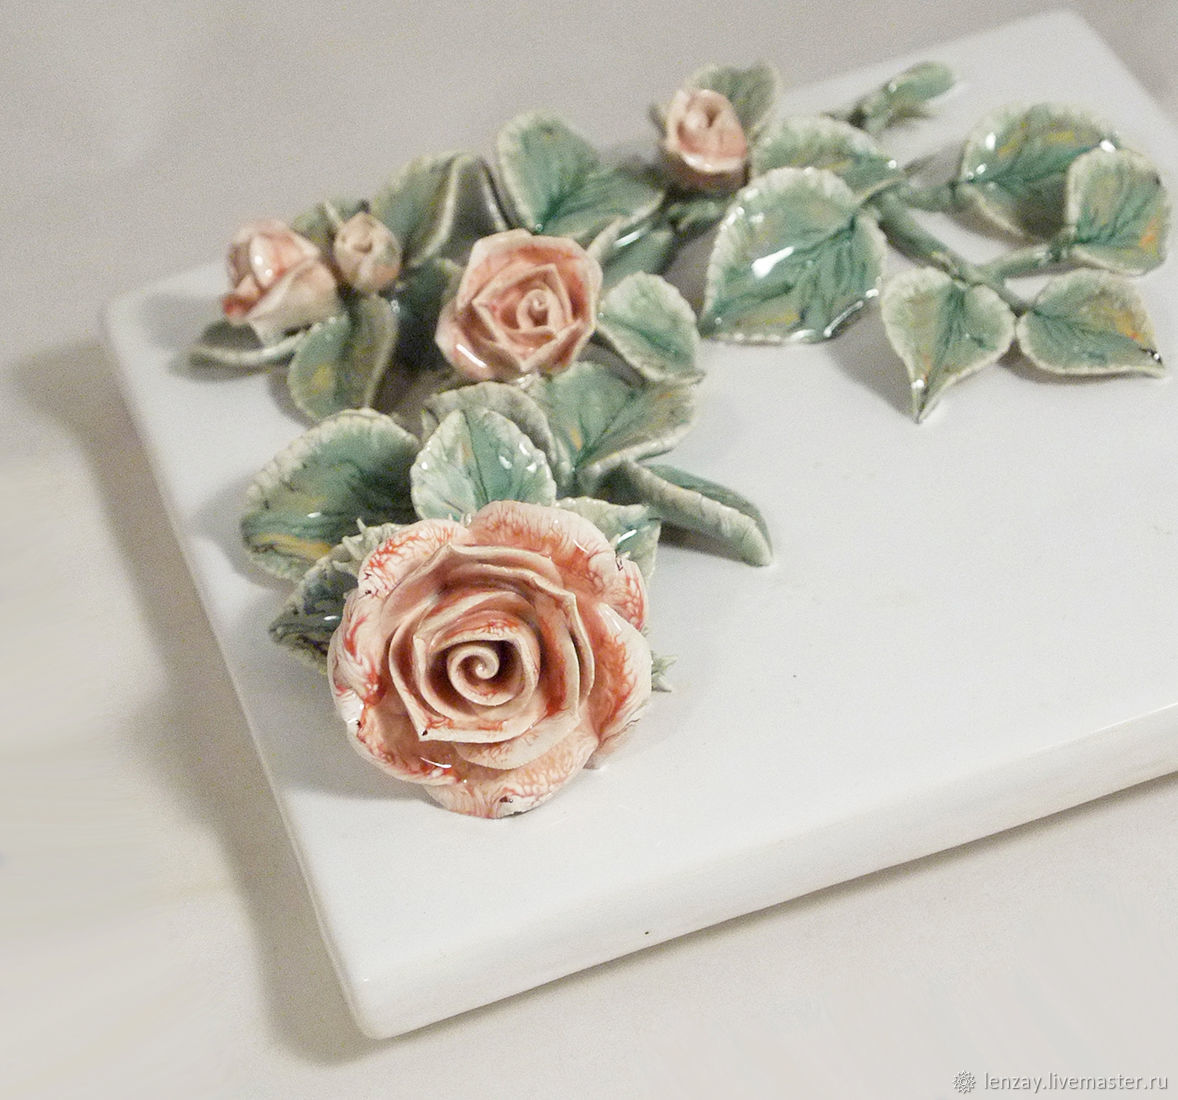 Ceramic tiles/panels `Climbing rose`. Ceramic floristry Elena Zaichenko.